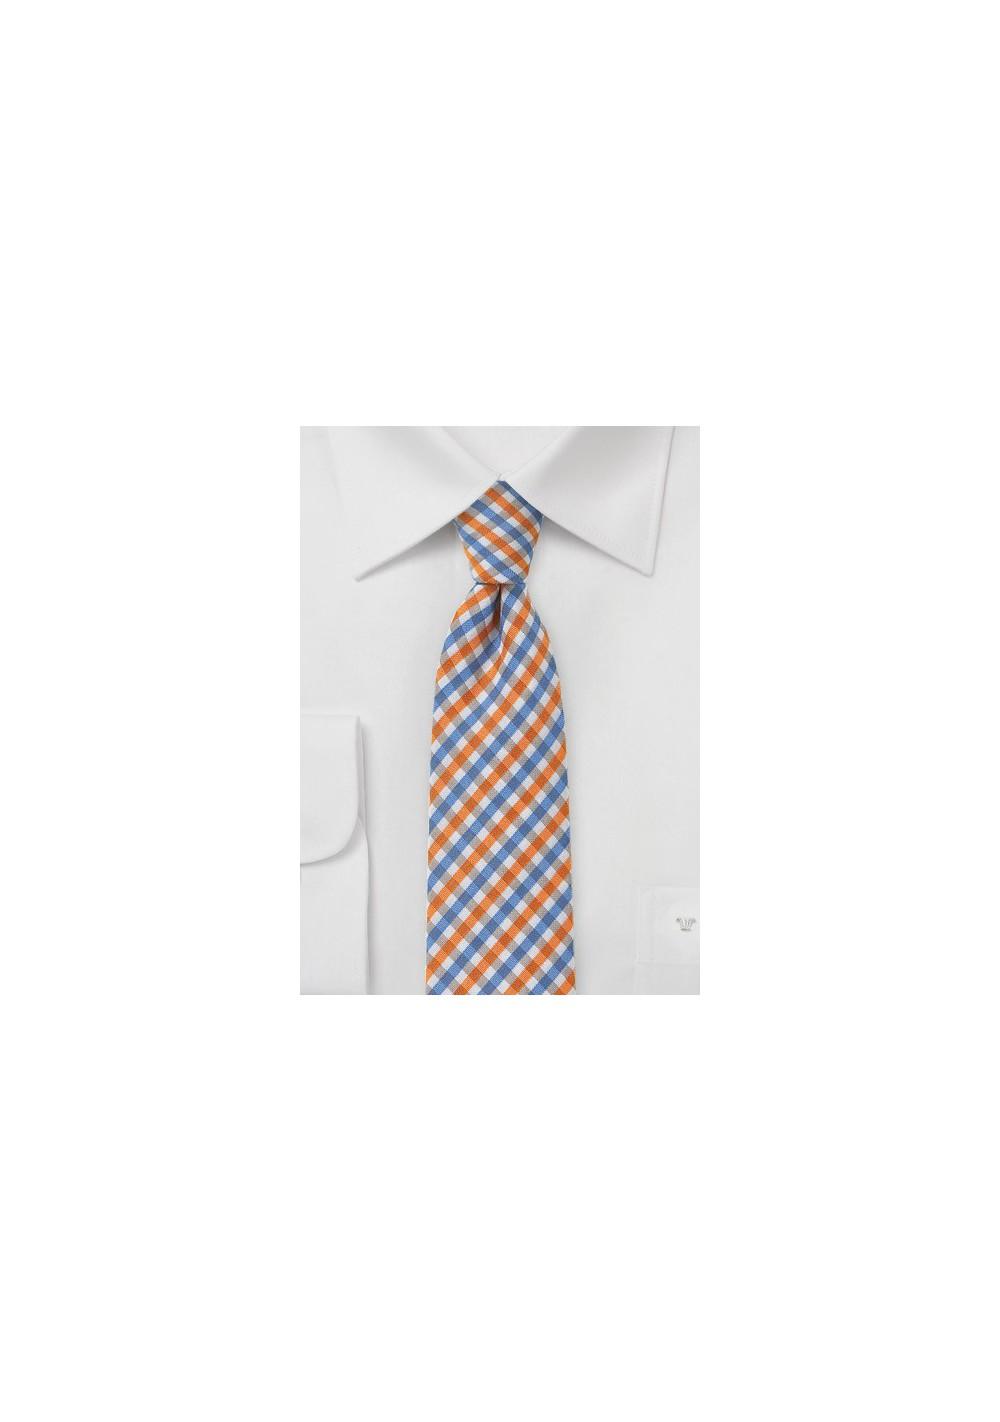 Slim Gingham Tie in Oranges and Blues